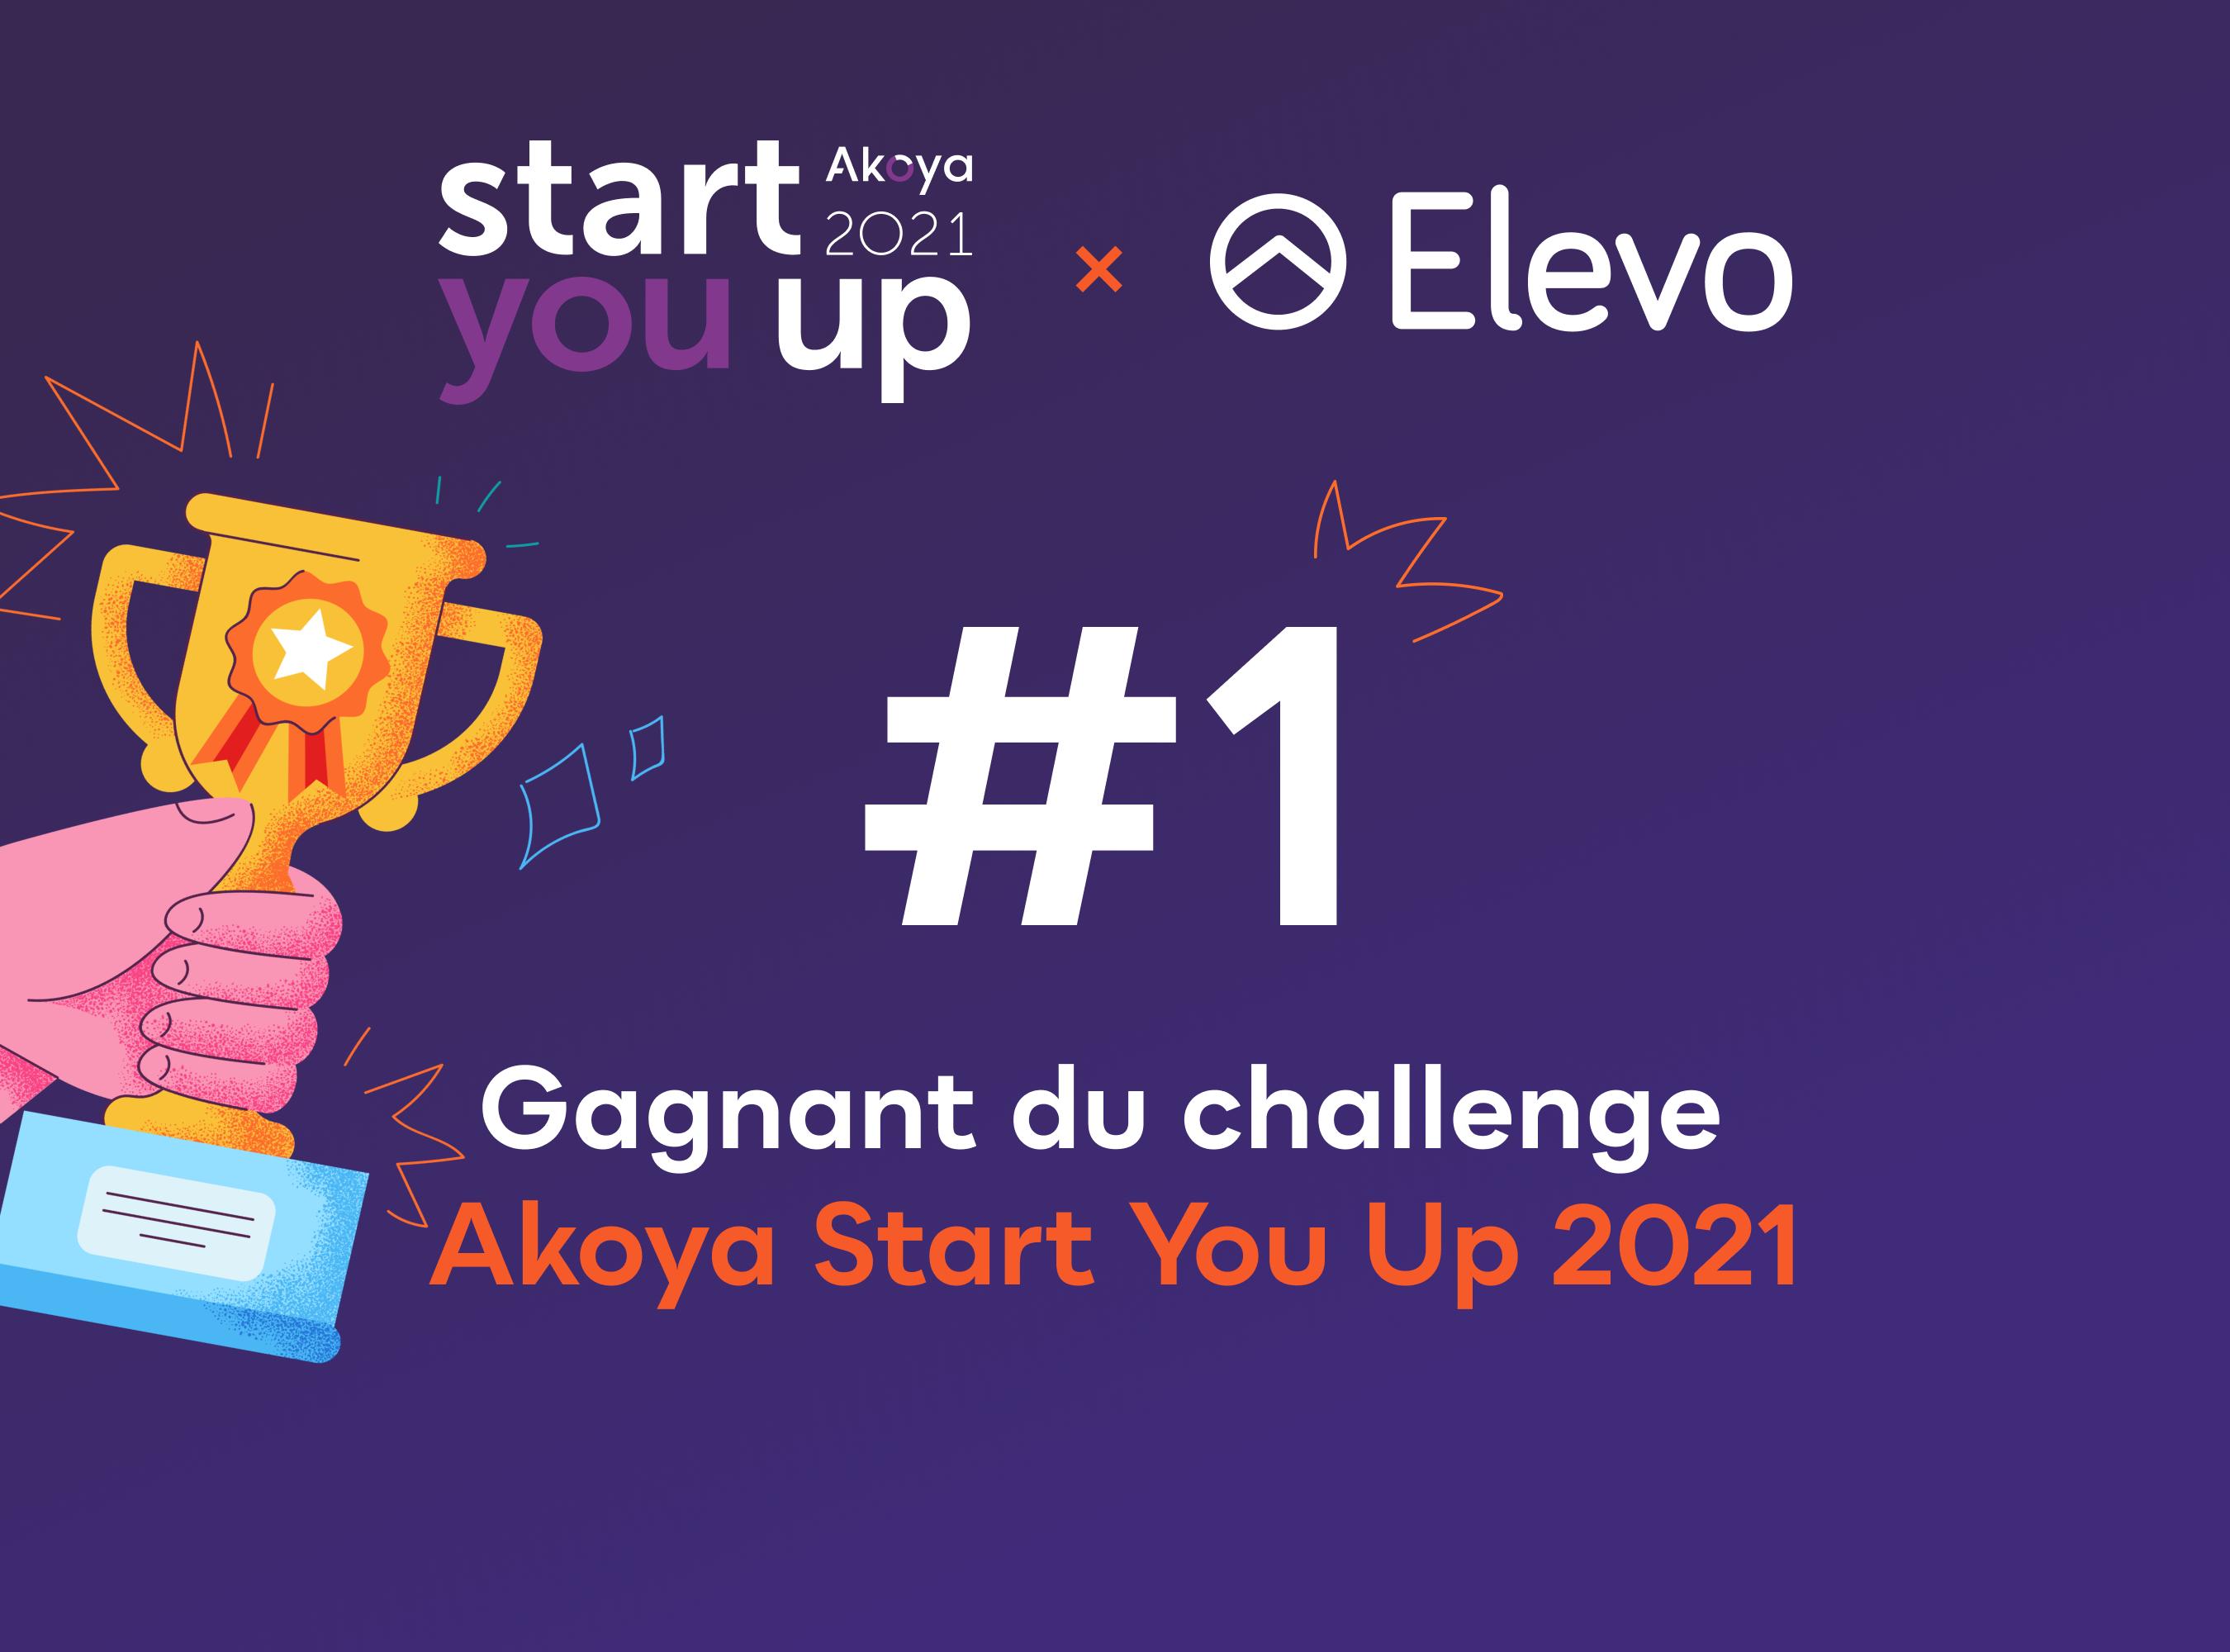 Akoya Start You Up 2021 : Elevo remporte le prix HR tech de l'année